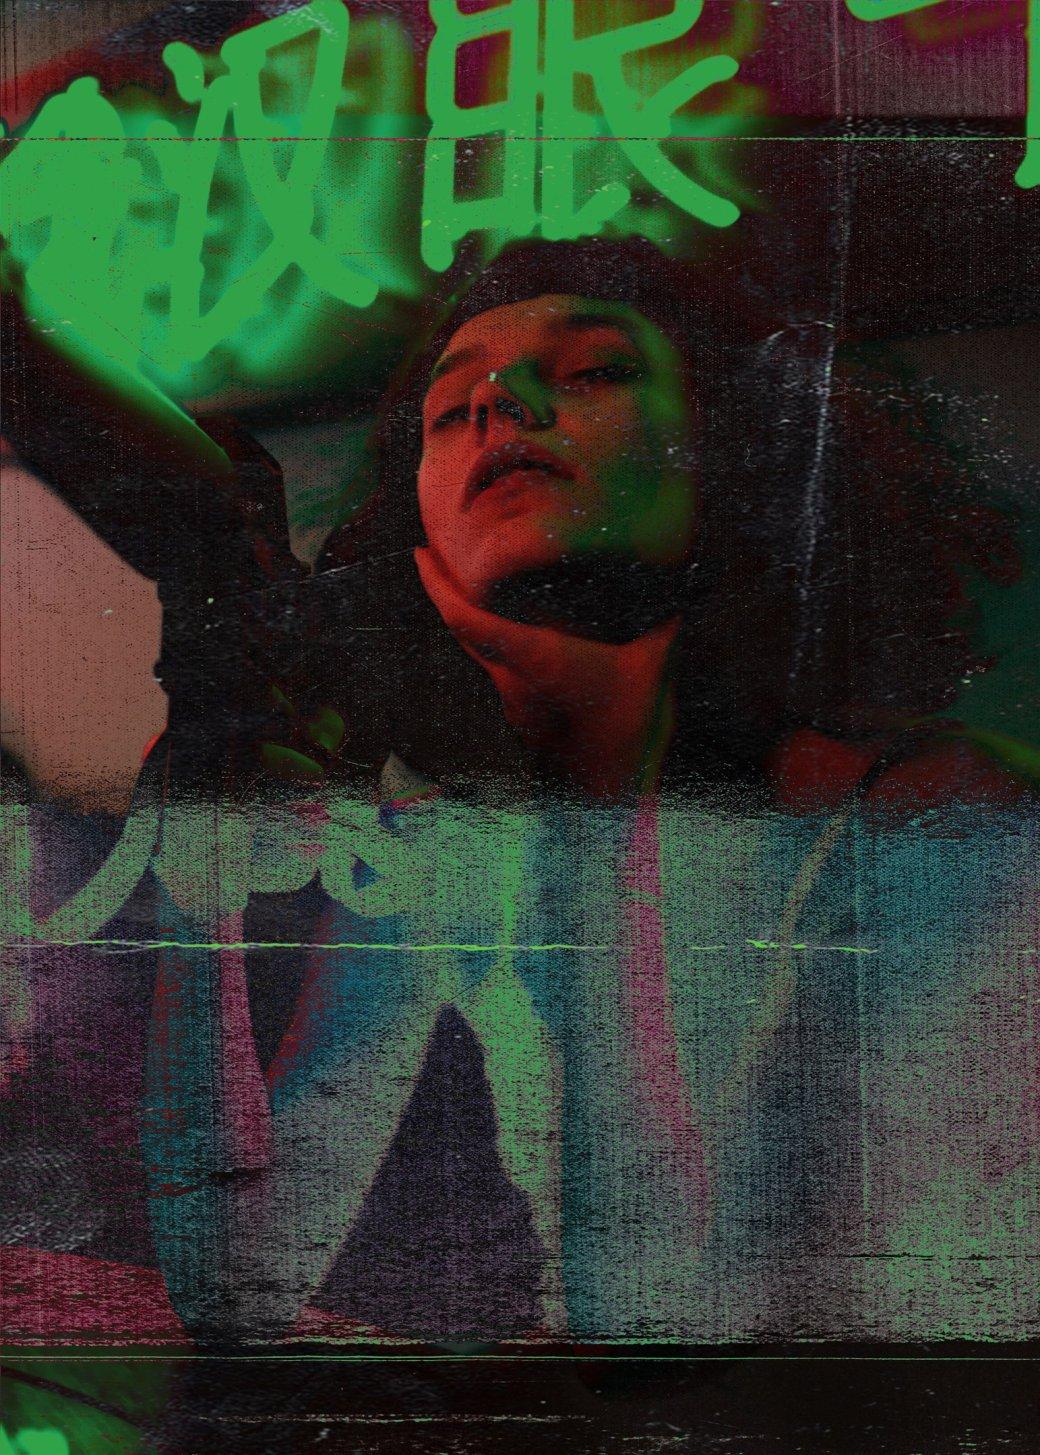 План А — музыка, план Б — киберспорт. Интервью с певицей DaKooka — о музыкальной диктатуре, WoW | Канобу - Изображение 4